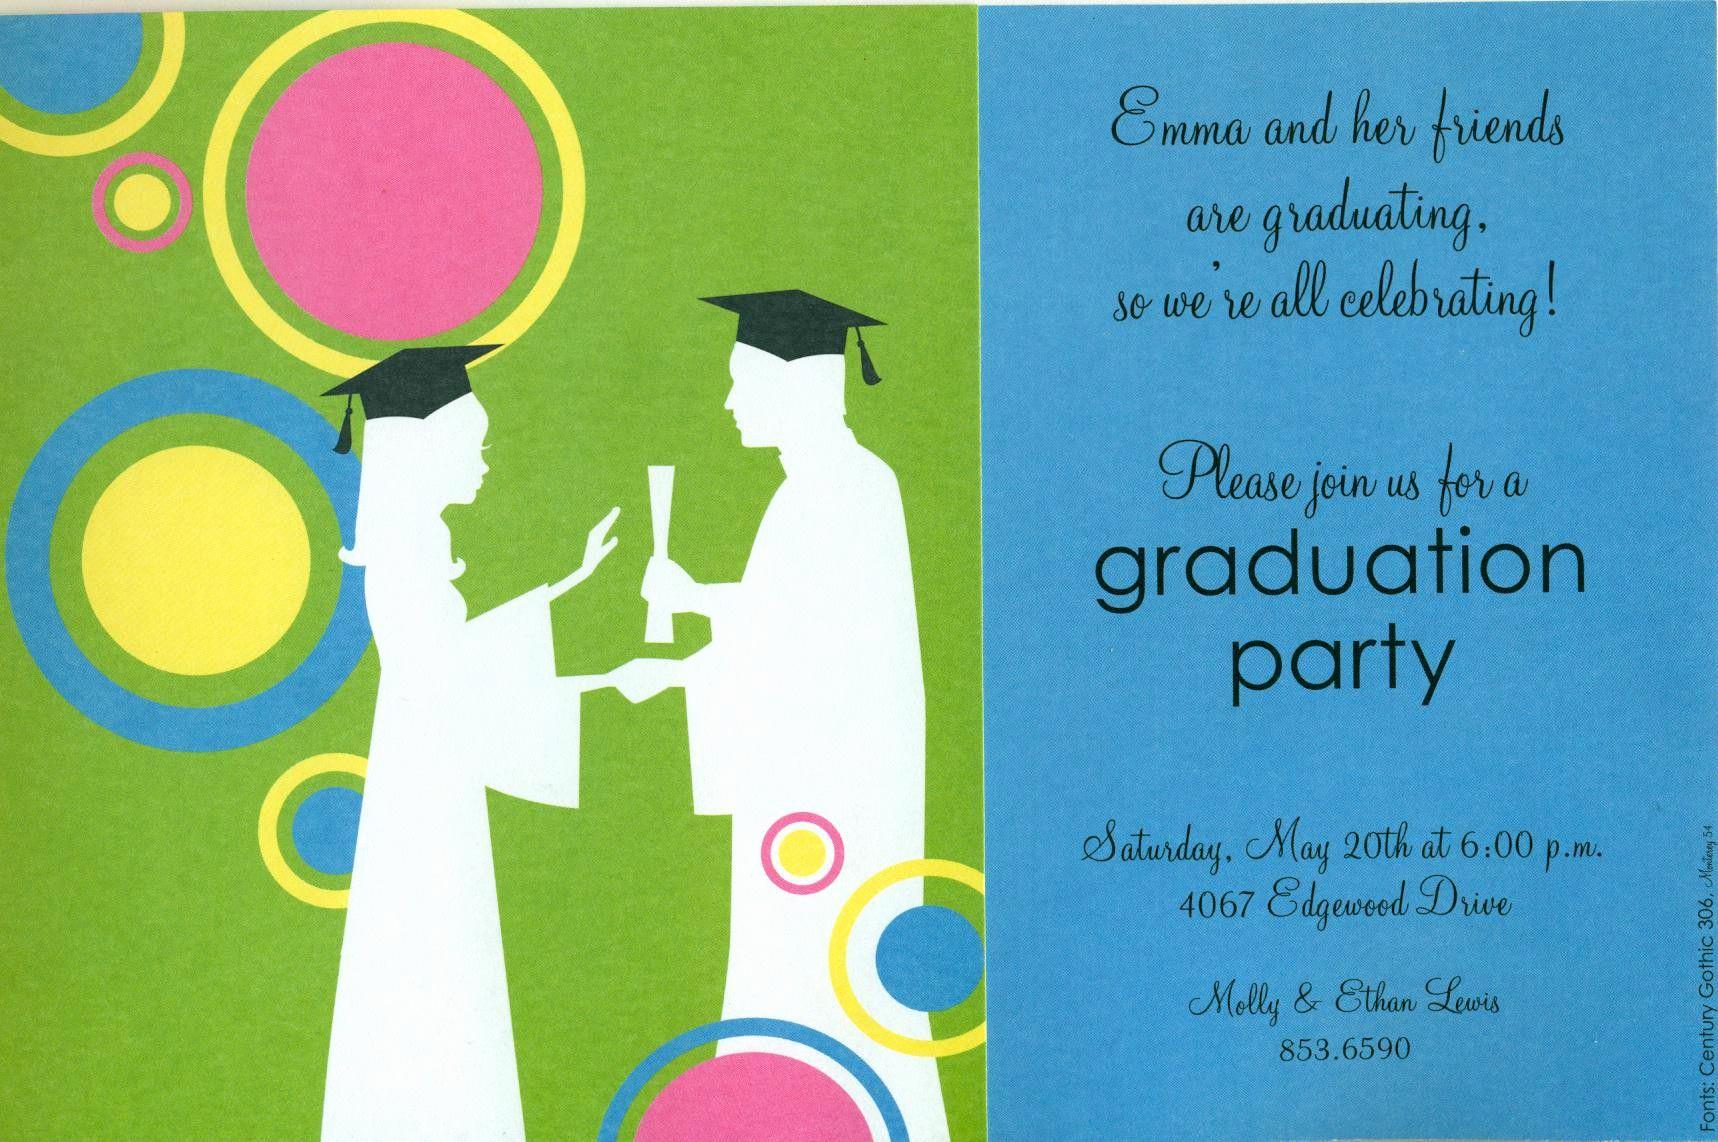 Graduation Invitation Templates 2016 Elegant Graduation Invitation Template Graduation Invitation